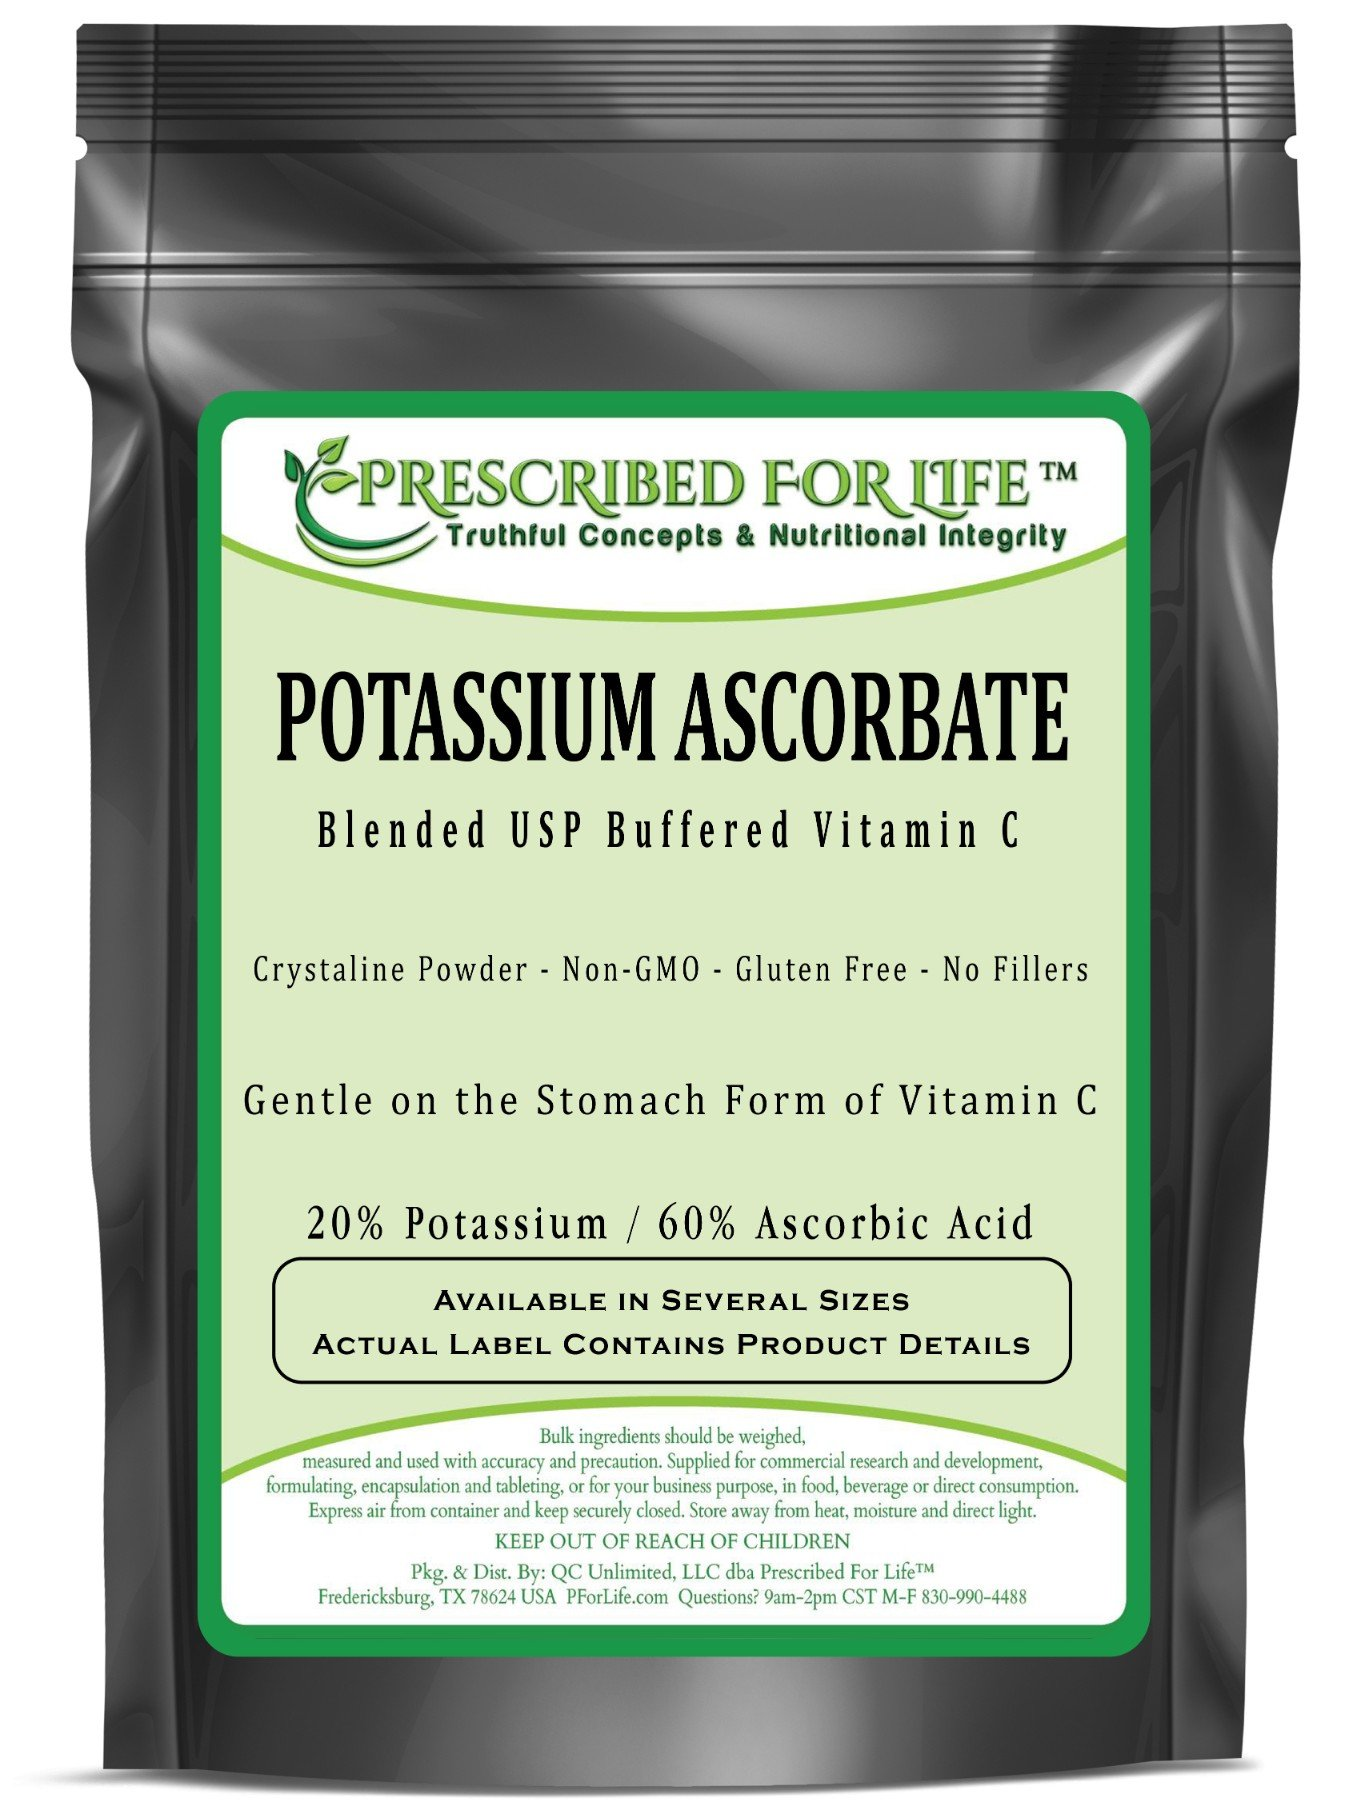 Potassium Ascorbate - Blended USP Buffered Vitamin C Powder - 20% K / 60% Ascorbic Acid, 25 kg